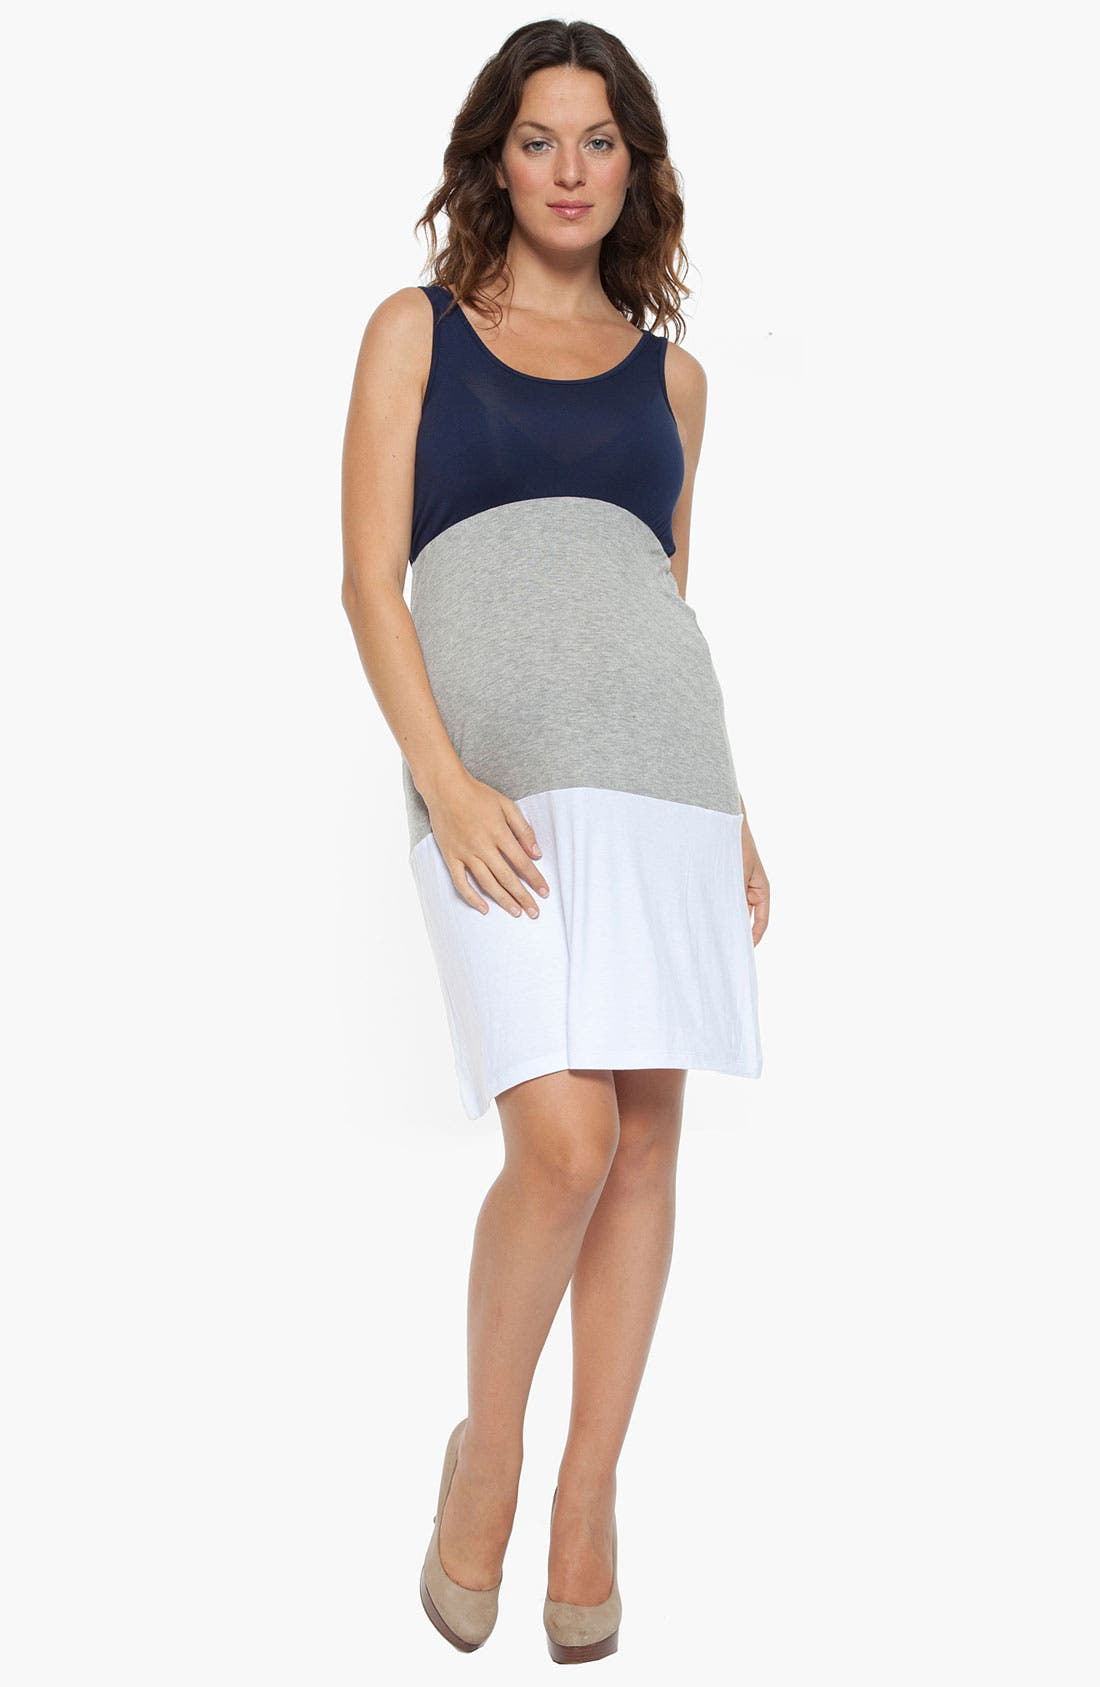 Main Image - Nom Maternity 'Cece' Maternity Tank Dress